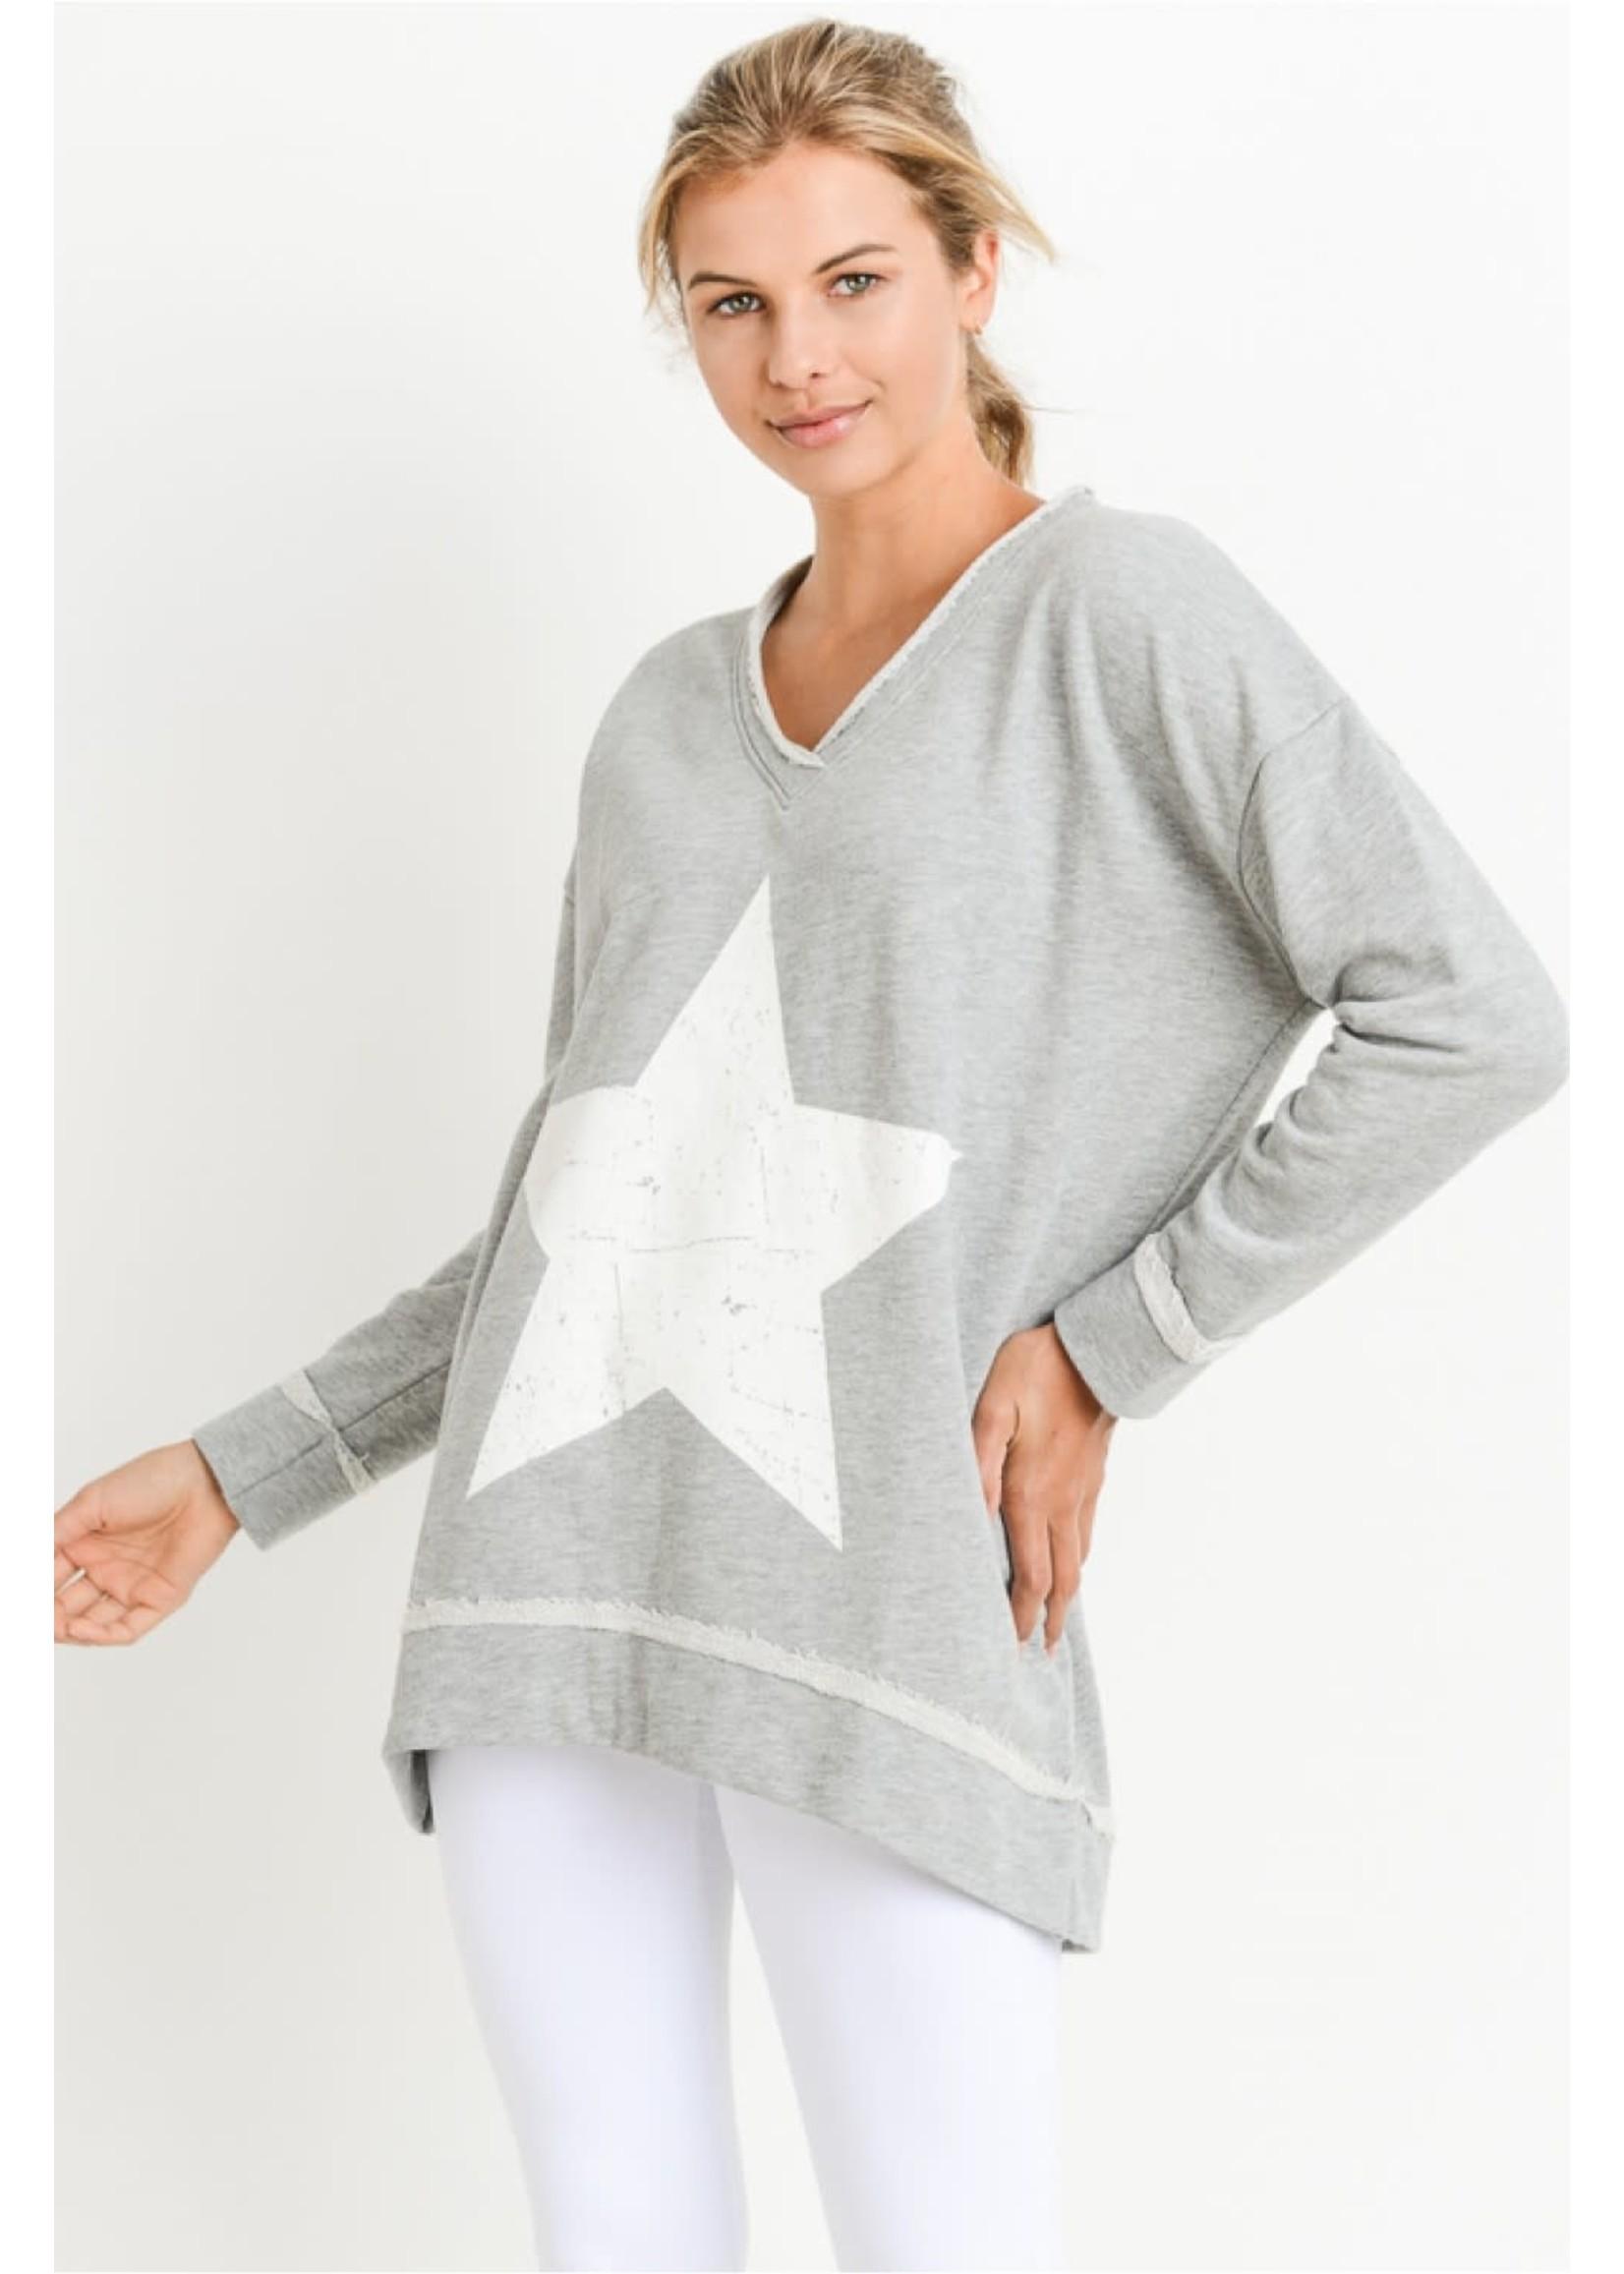 Mono B Antiqued Star V-Neck Sweatshirt